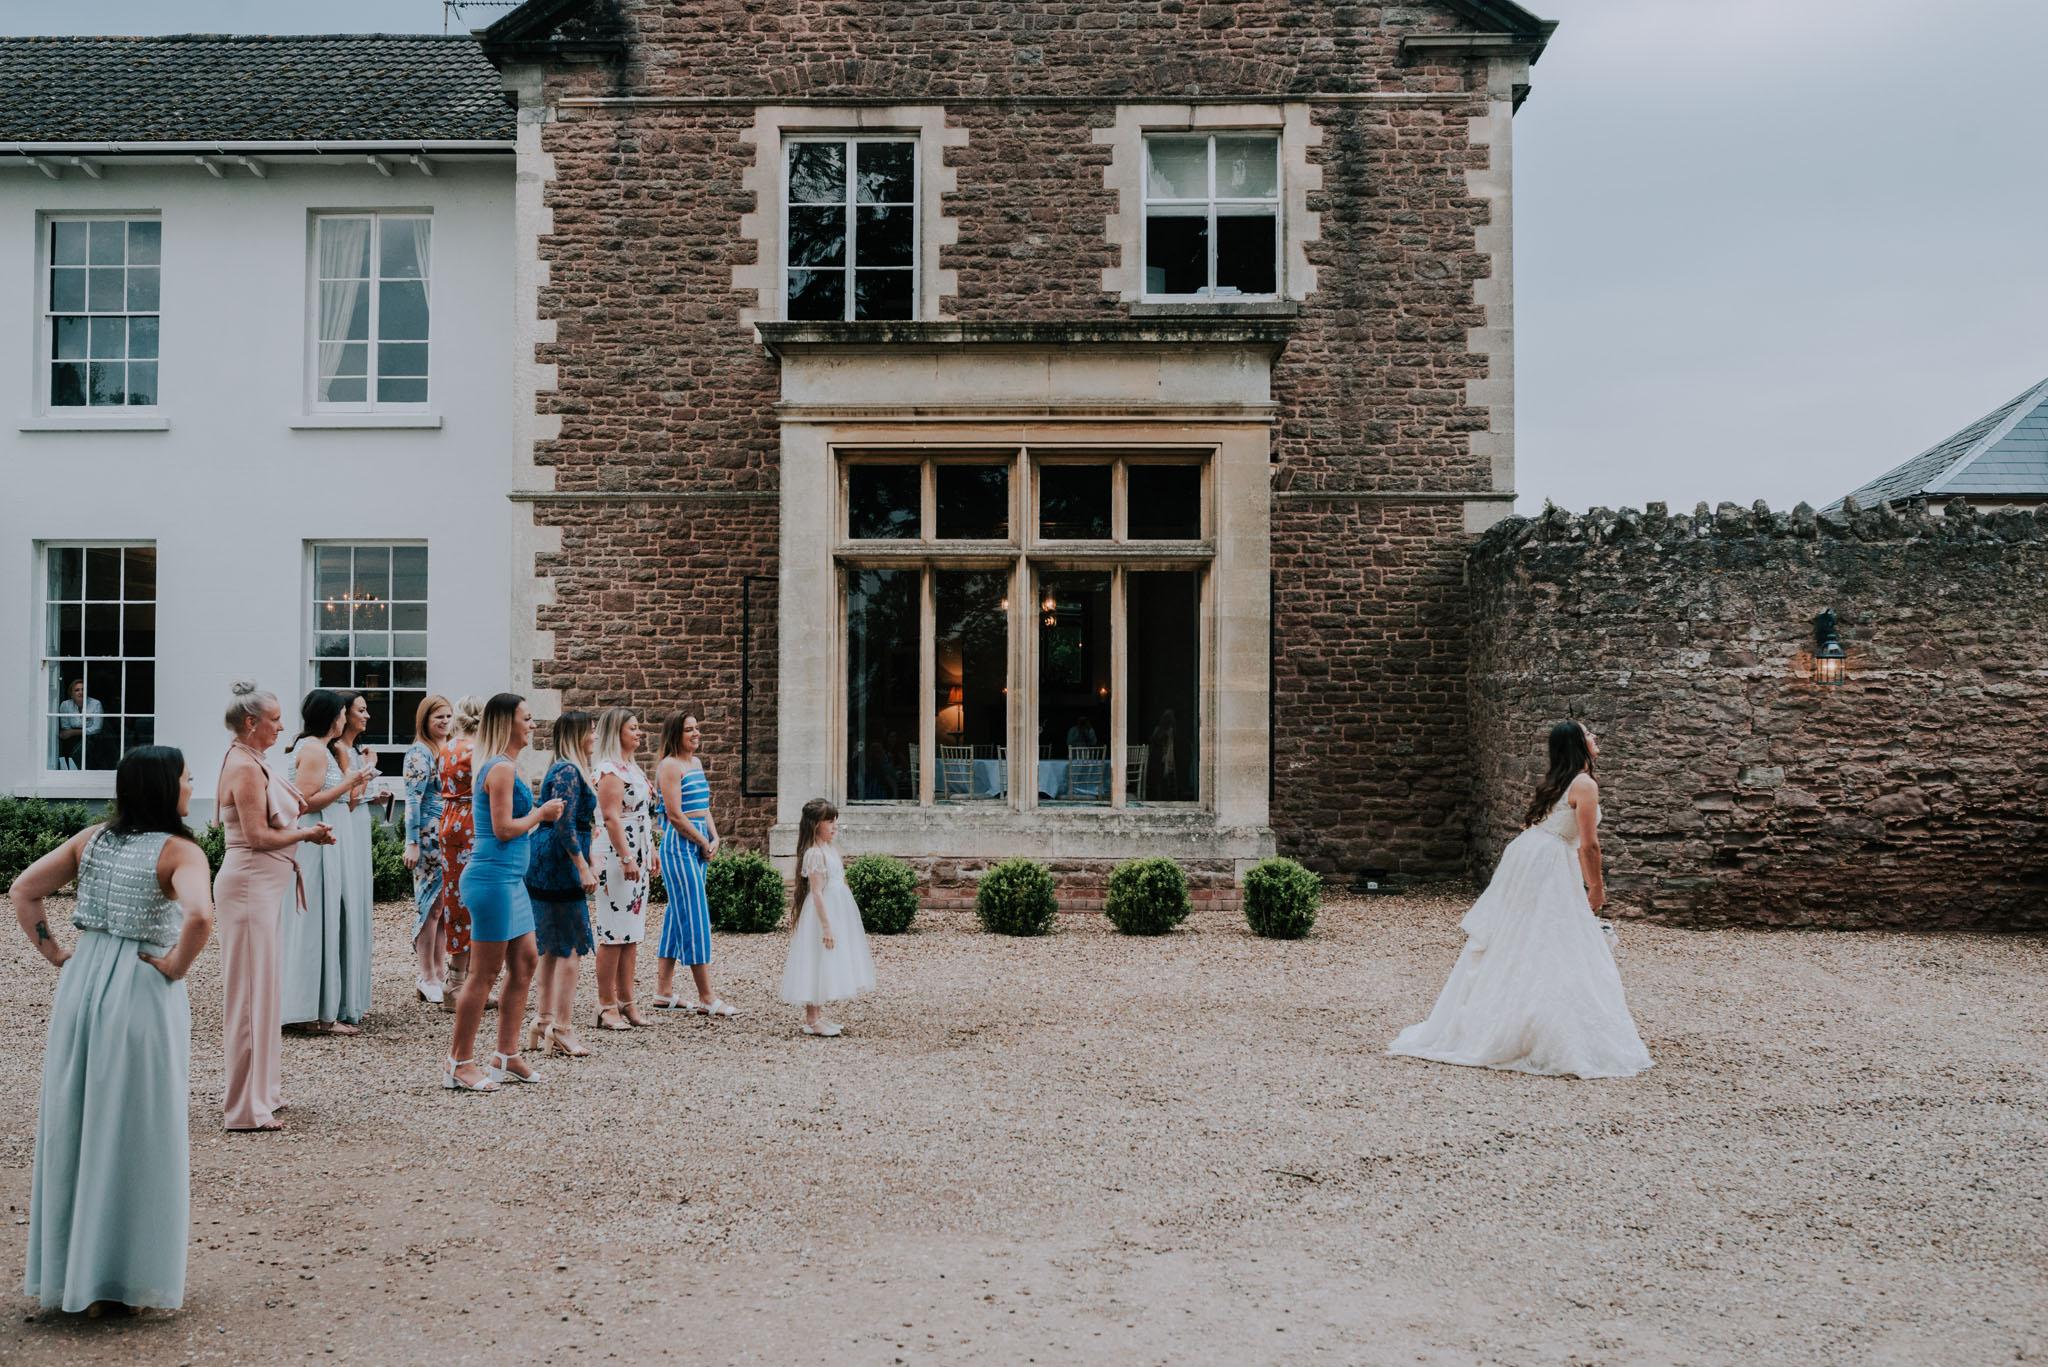 wedding-photographer-glewstone-court-hereford-scott-stockwell-photography463.jpg